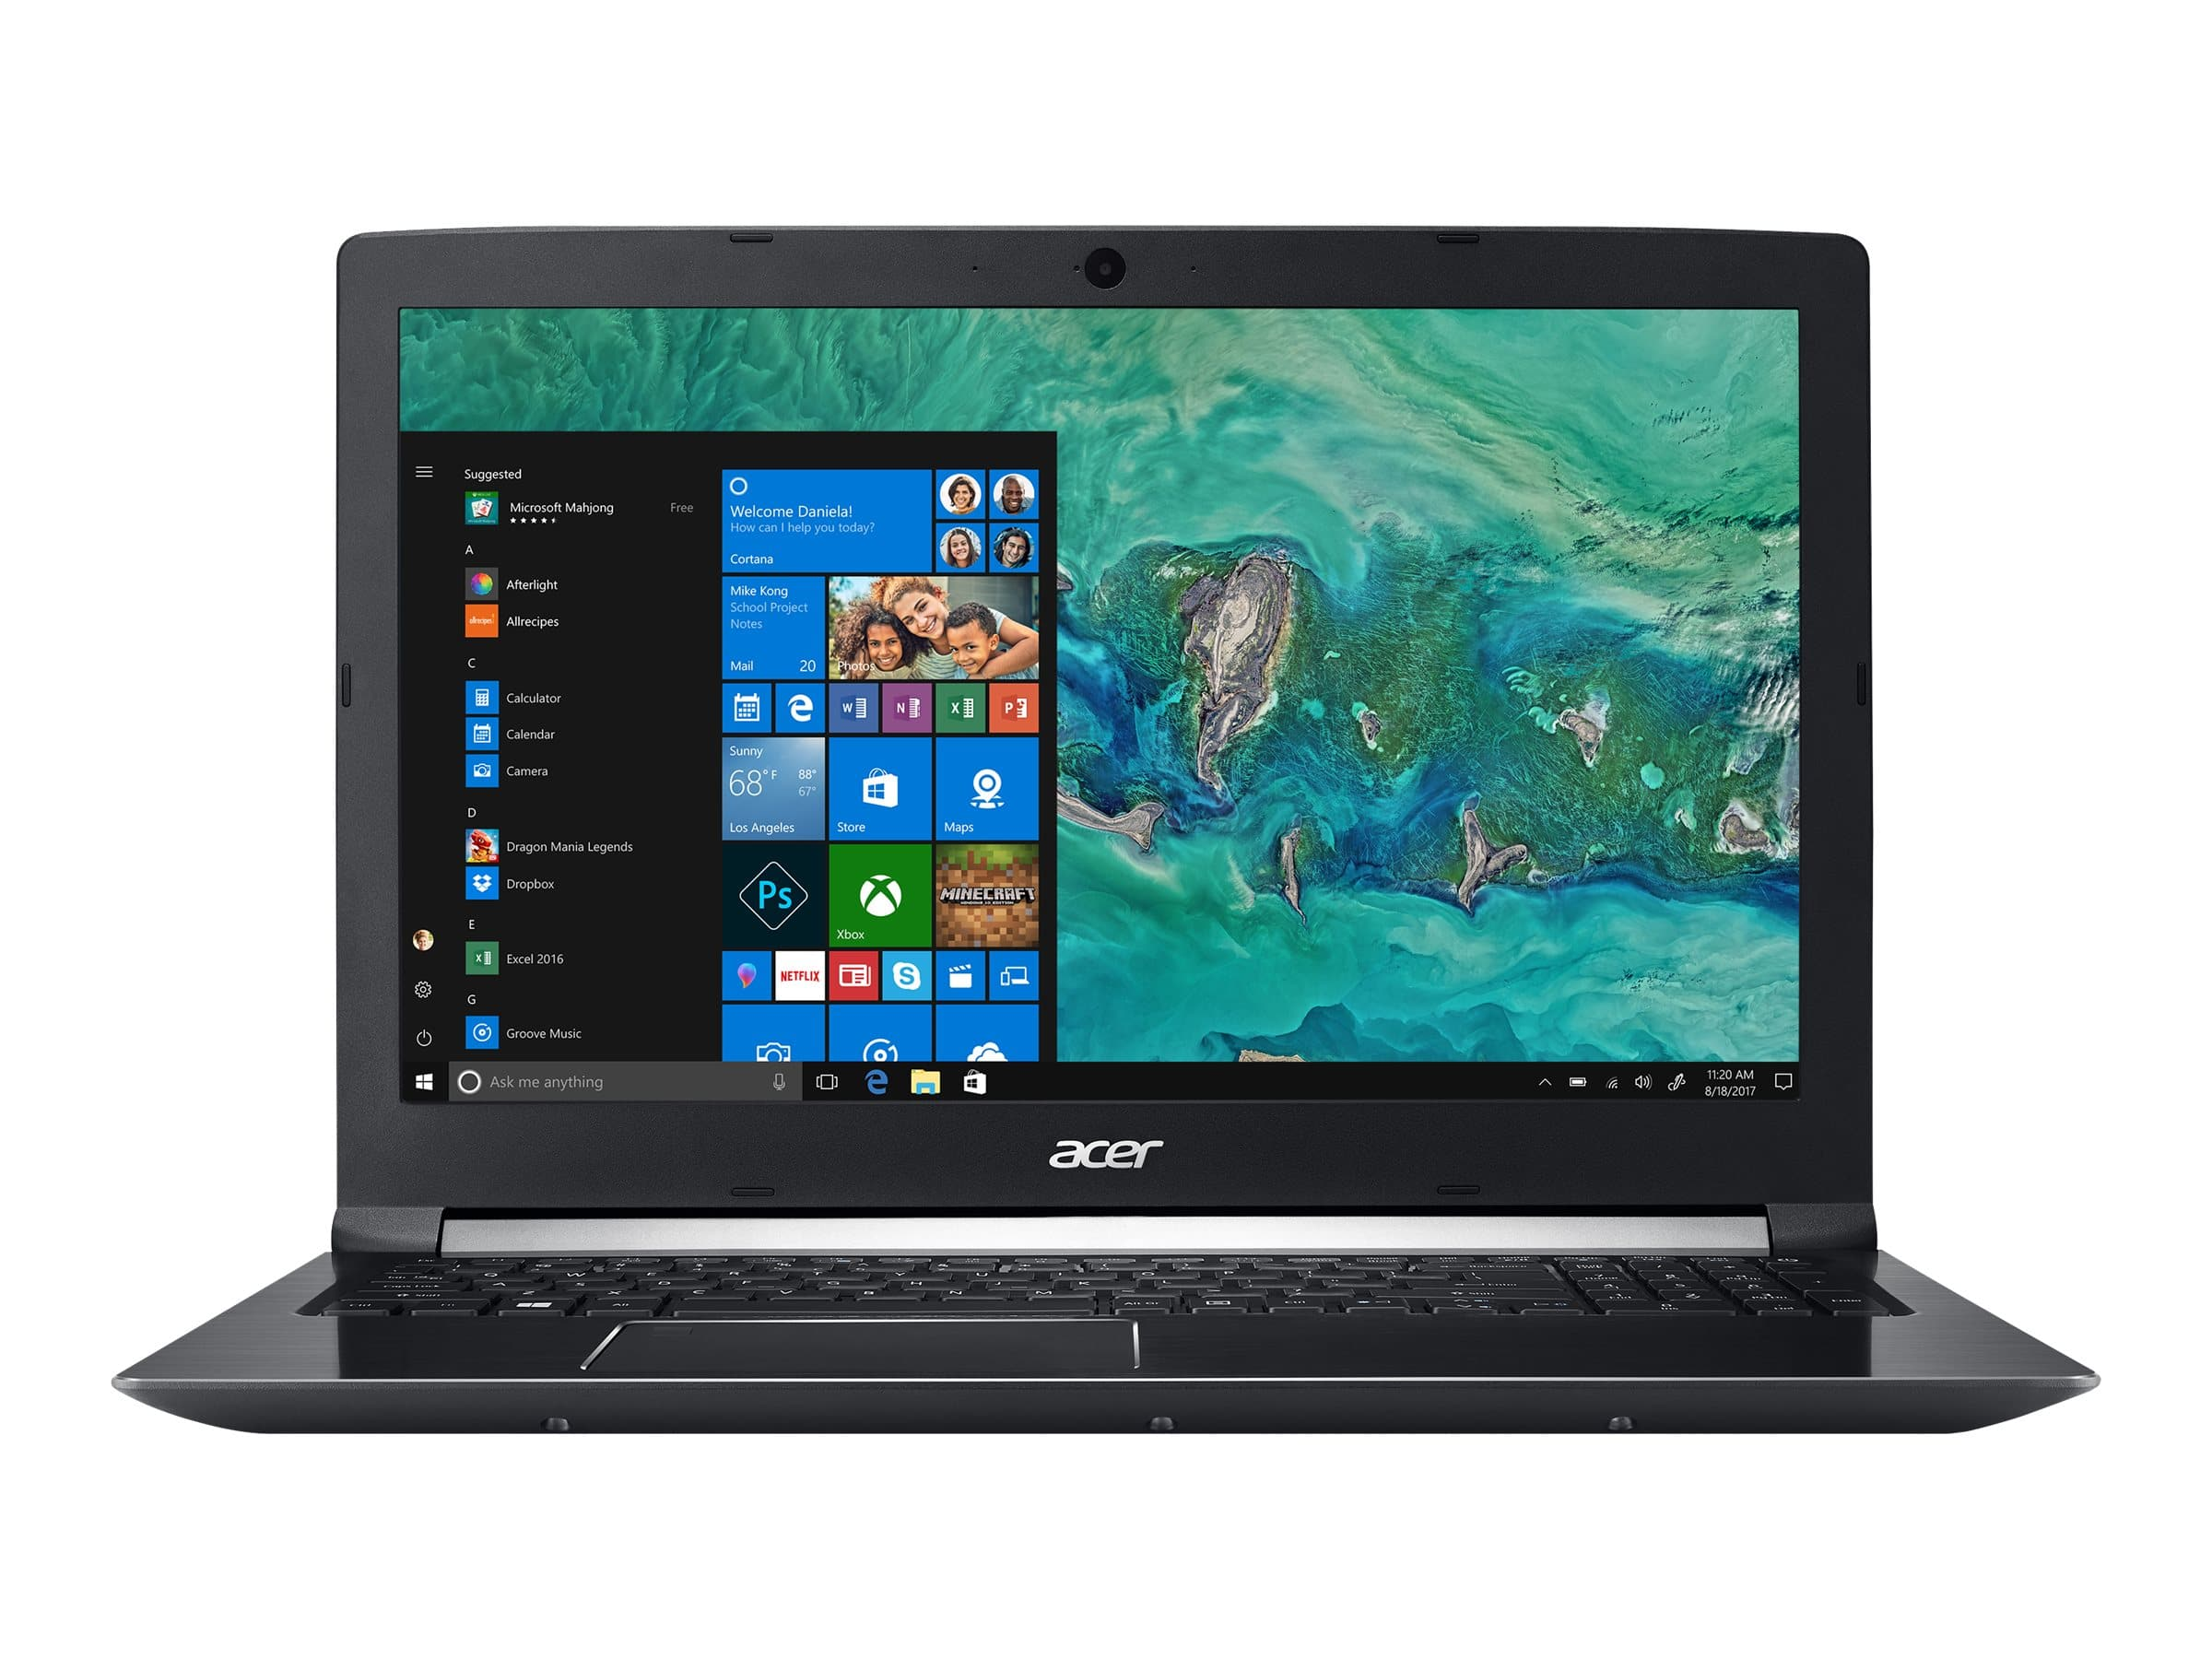 "Acer Aspire 7 A715-72G-79BH, 15.6"" Full HD, 8th Gen Intel Core i7-8750H, NVIDIA GeForce GTX 1050, 8GB DDR4, 1TB HDD, HDMI 2.0, Fingerprint Reader, Windows Hello, $599"